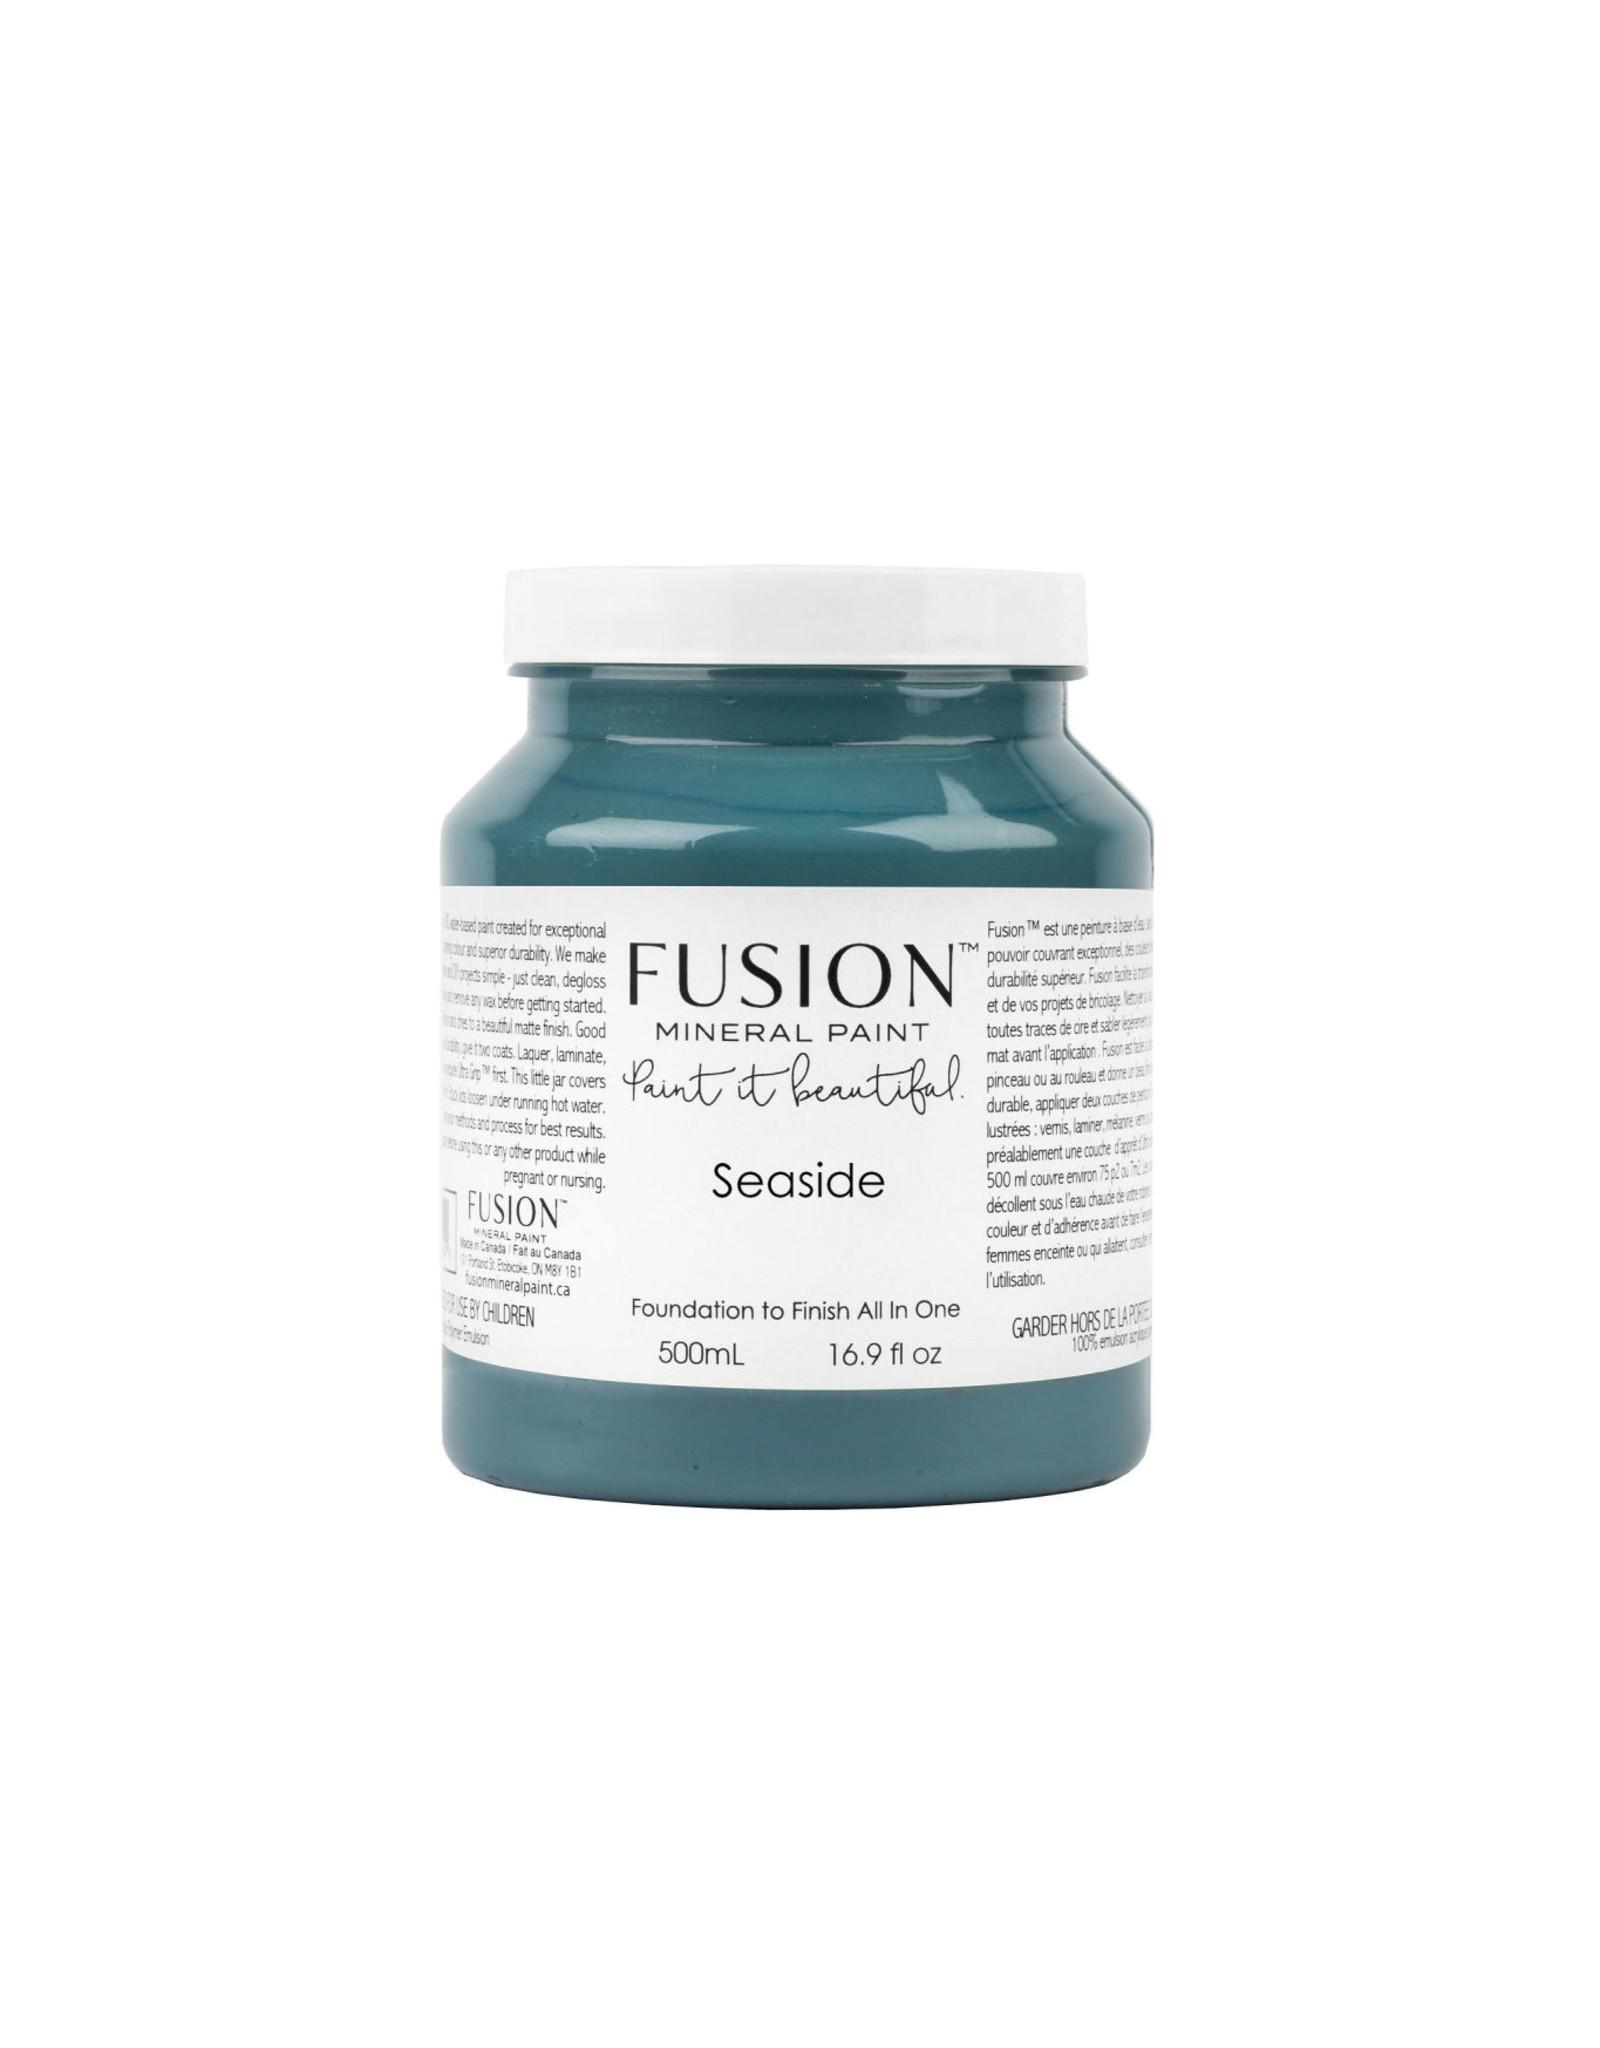 Fusion Mineral Paint Fusion Mineral Paint - Seaside 500ml